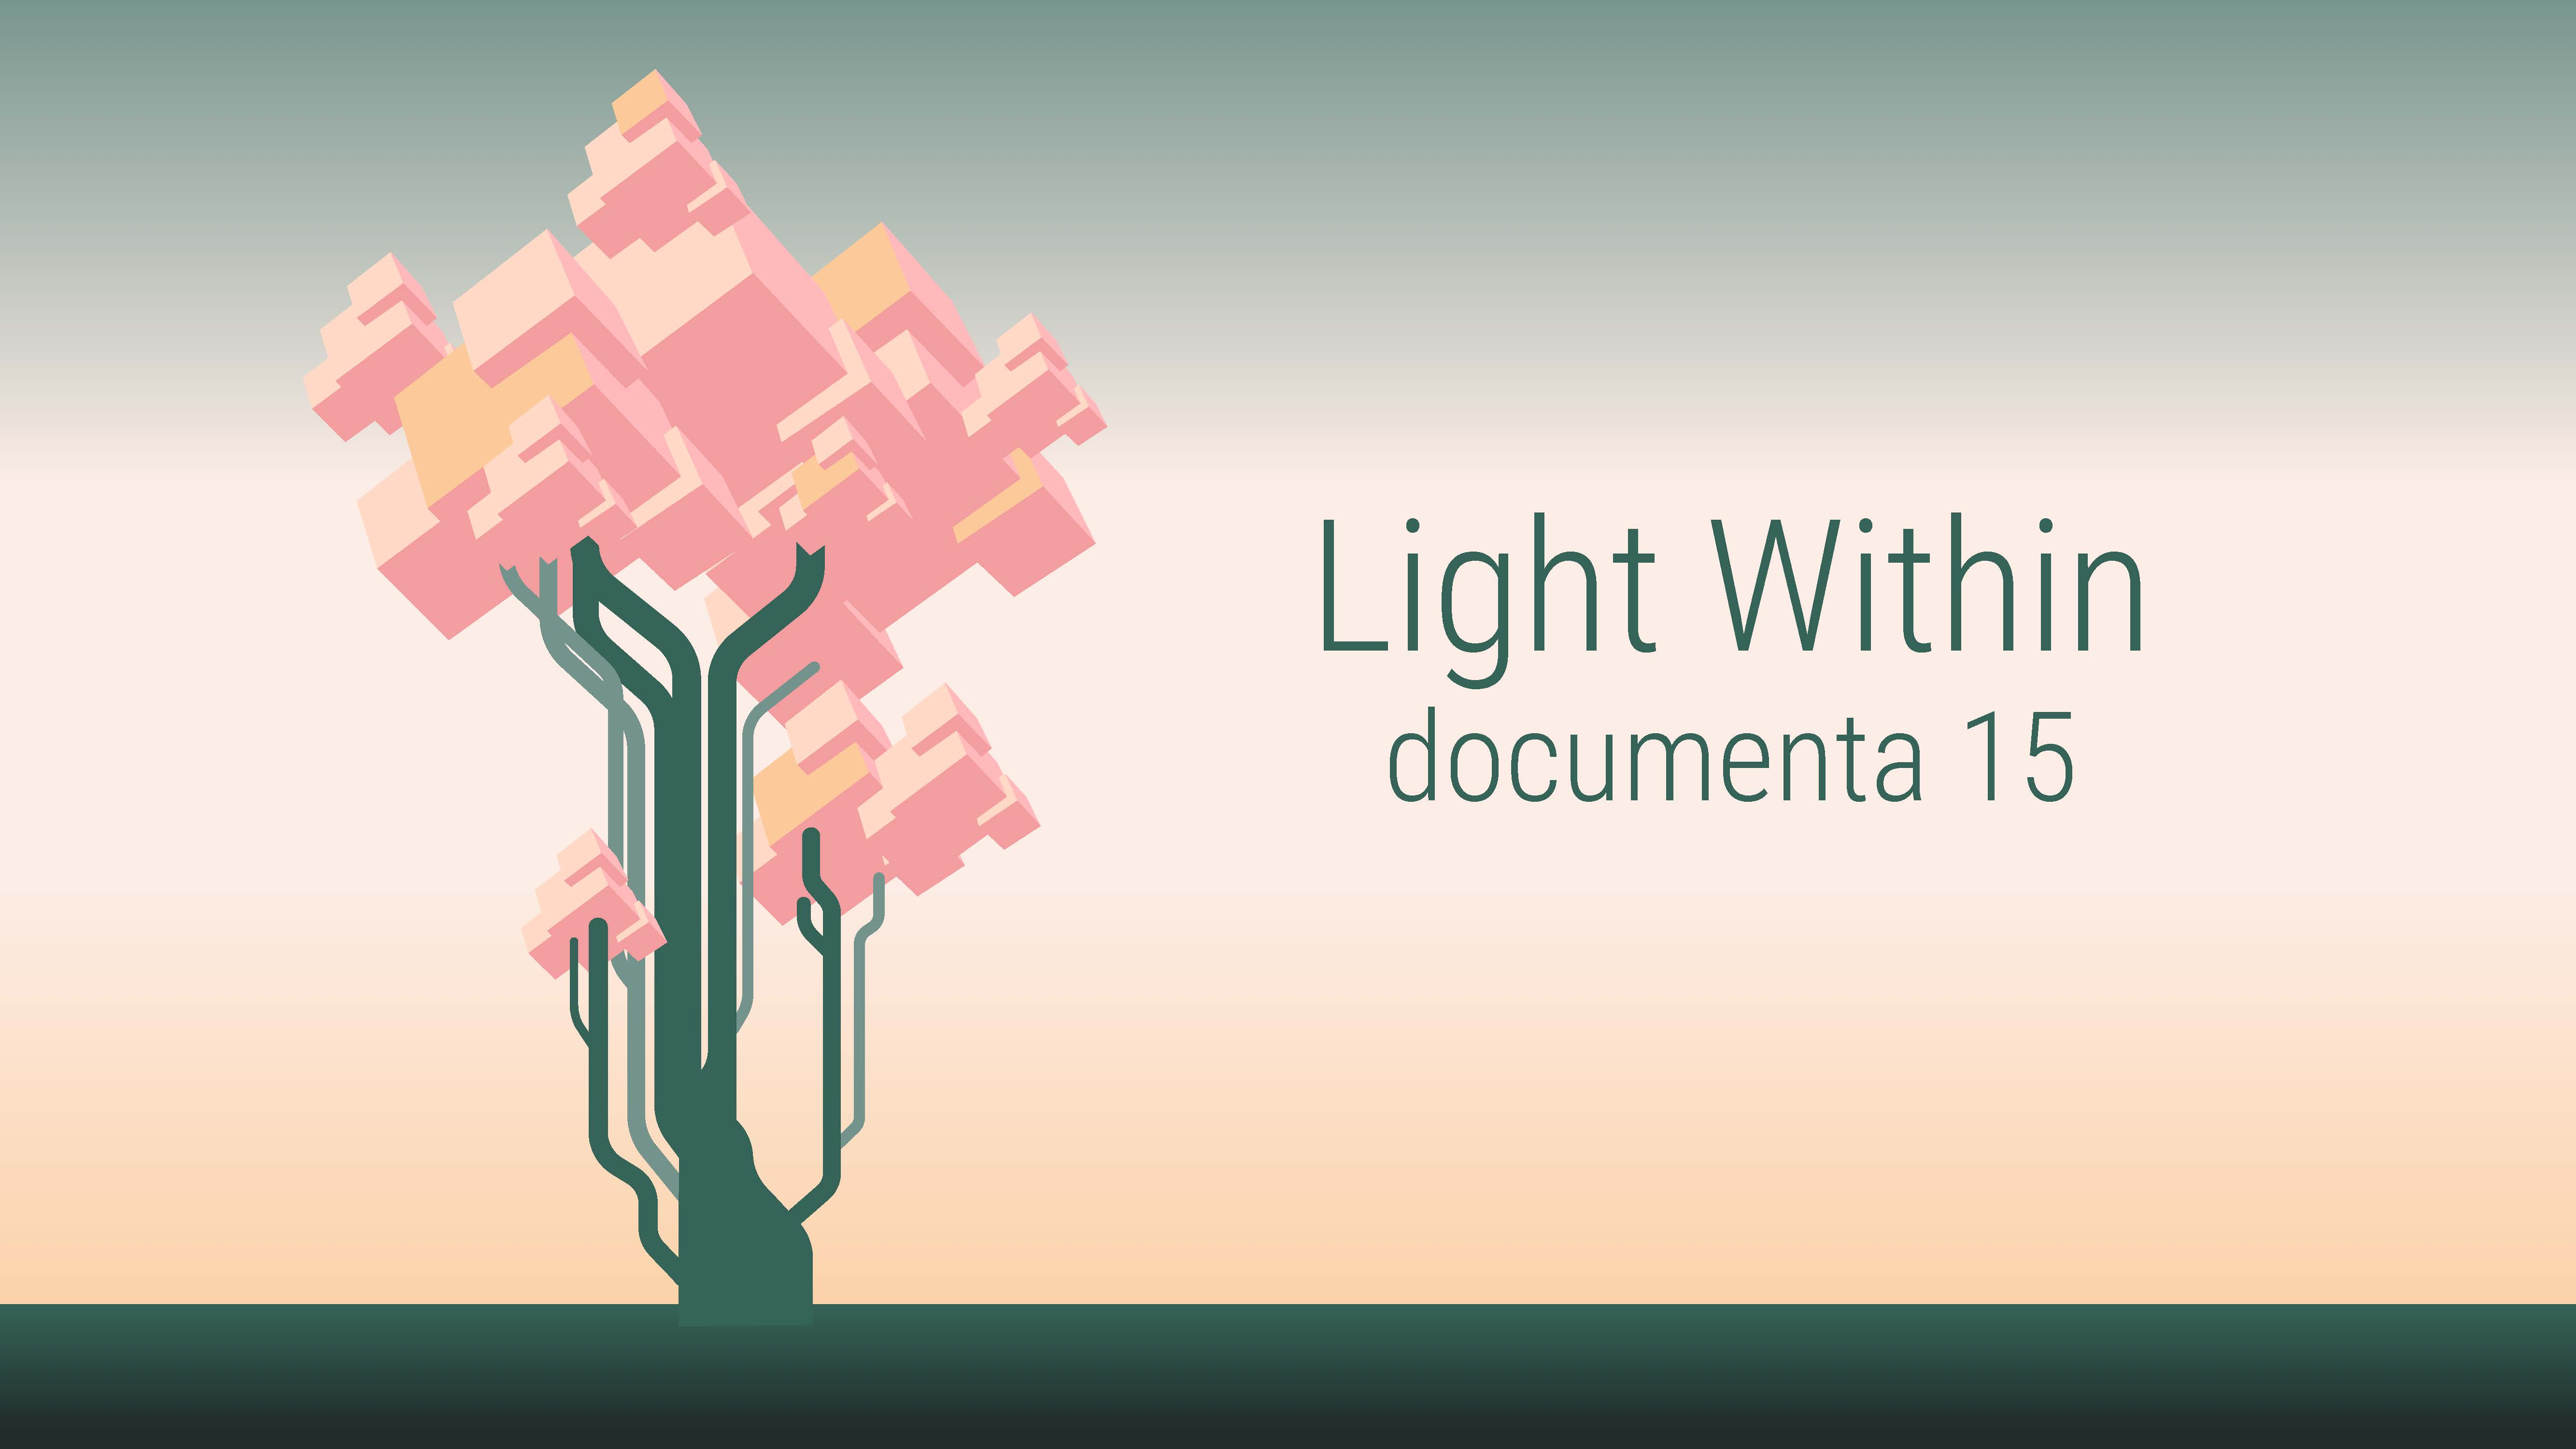 documenta 15 - Light Within